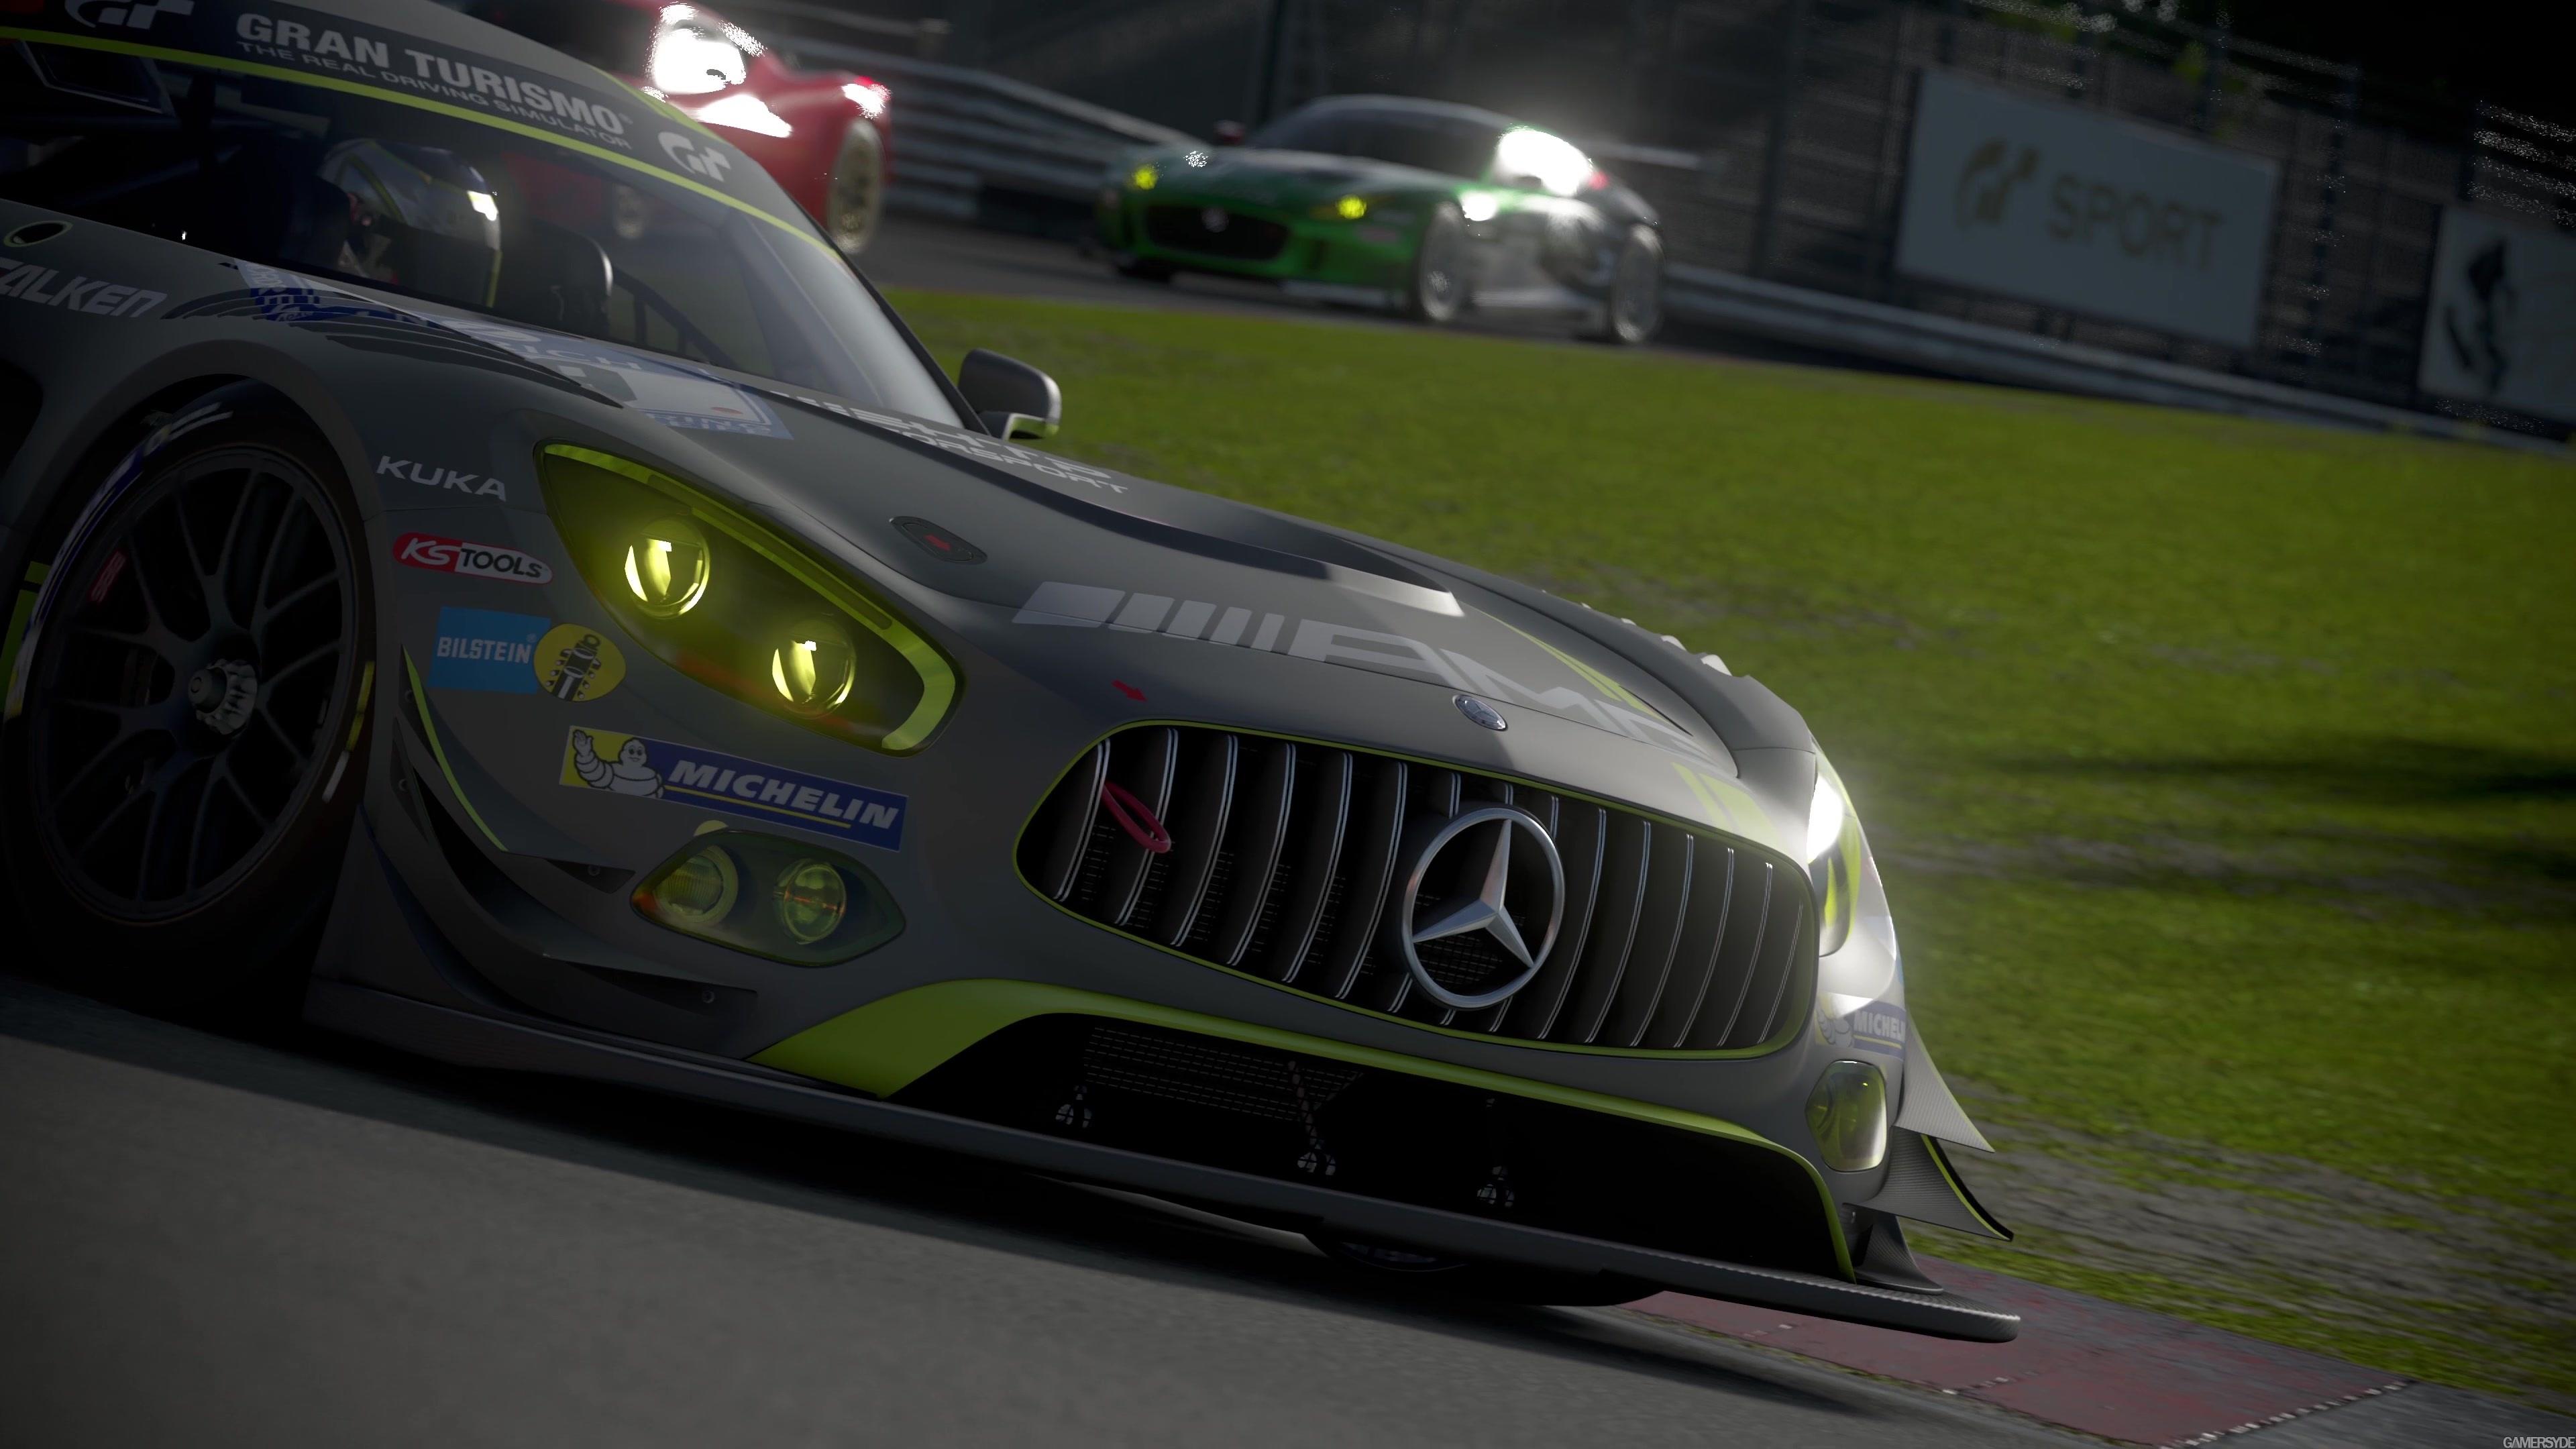 『Forza』シリーズ累計10億ドルを突破 『Horizon 3』は250万本で今世代最も売れたレースゲームに [無断転載禁止]©2ch.netYouTube動画>9本 ->画像>522枚